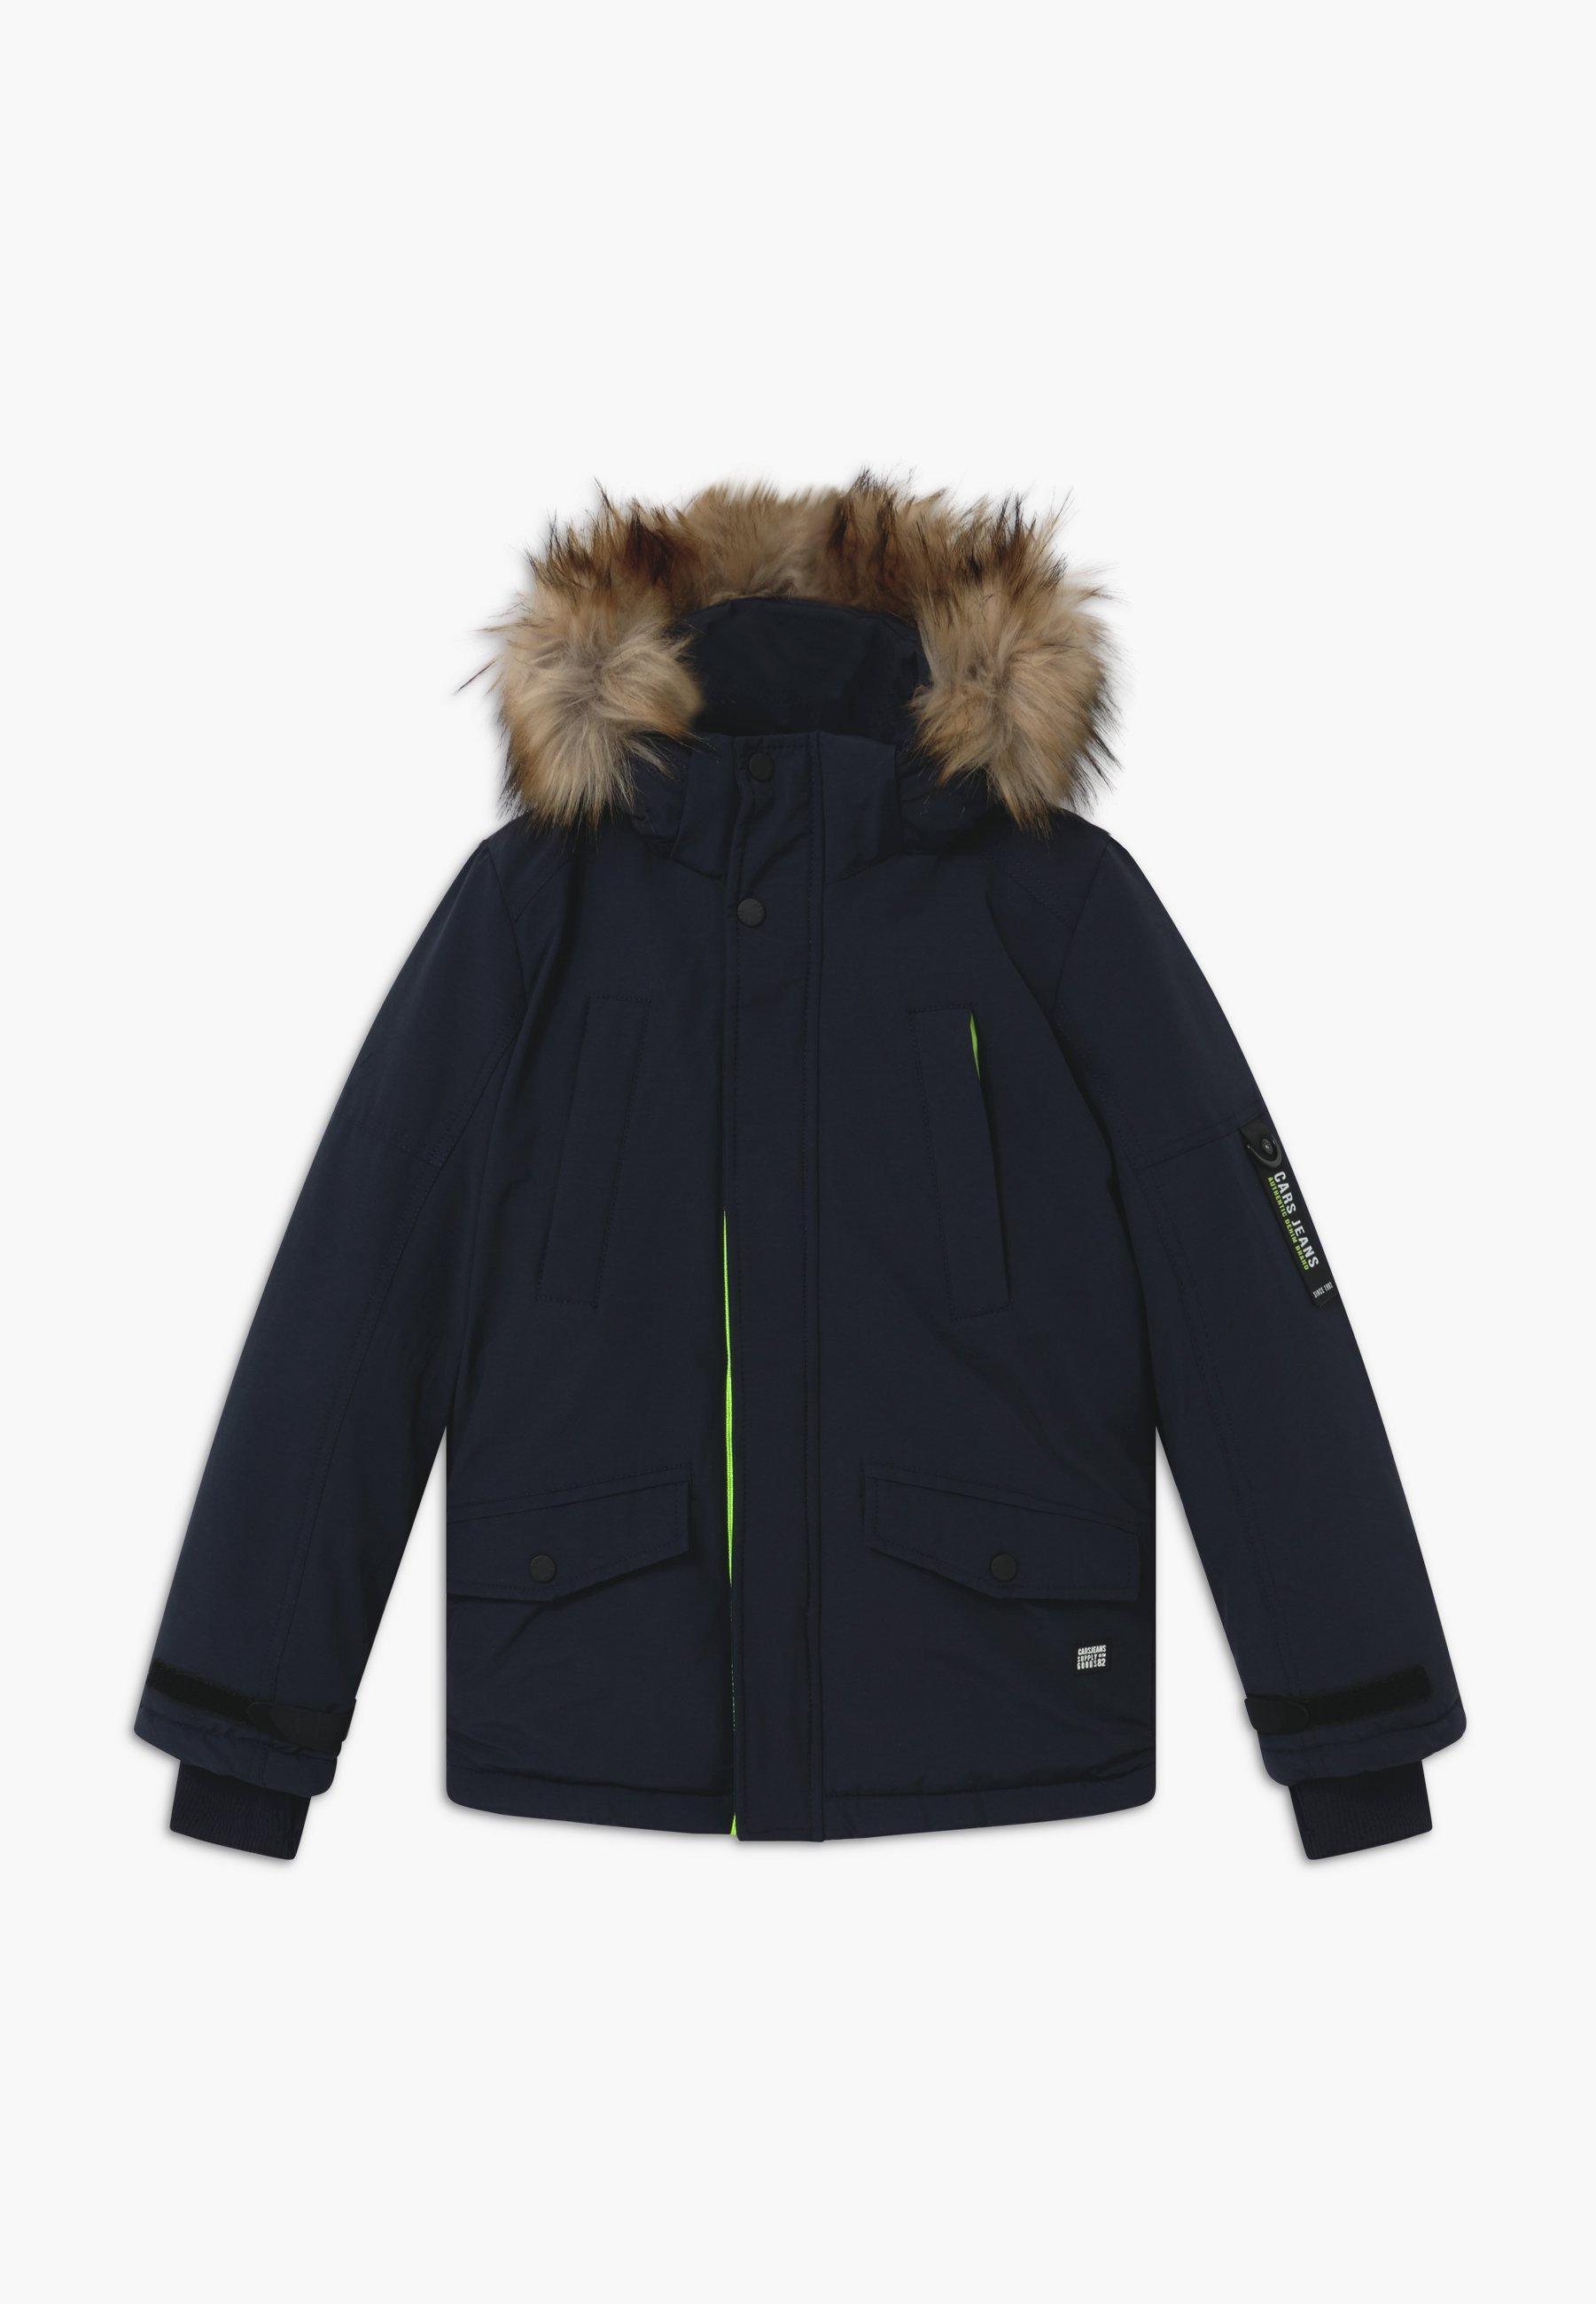 2013 Wholesale Cars Jeans KIDS STORROW - Winter jacket - navy | kids's clothing 2020 liop1